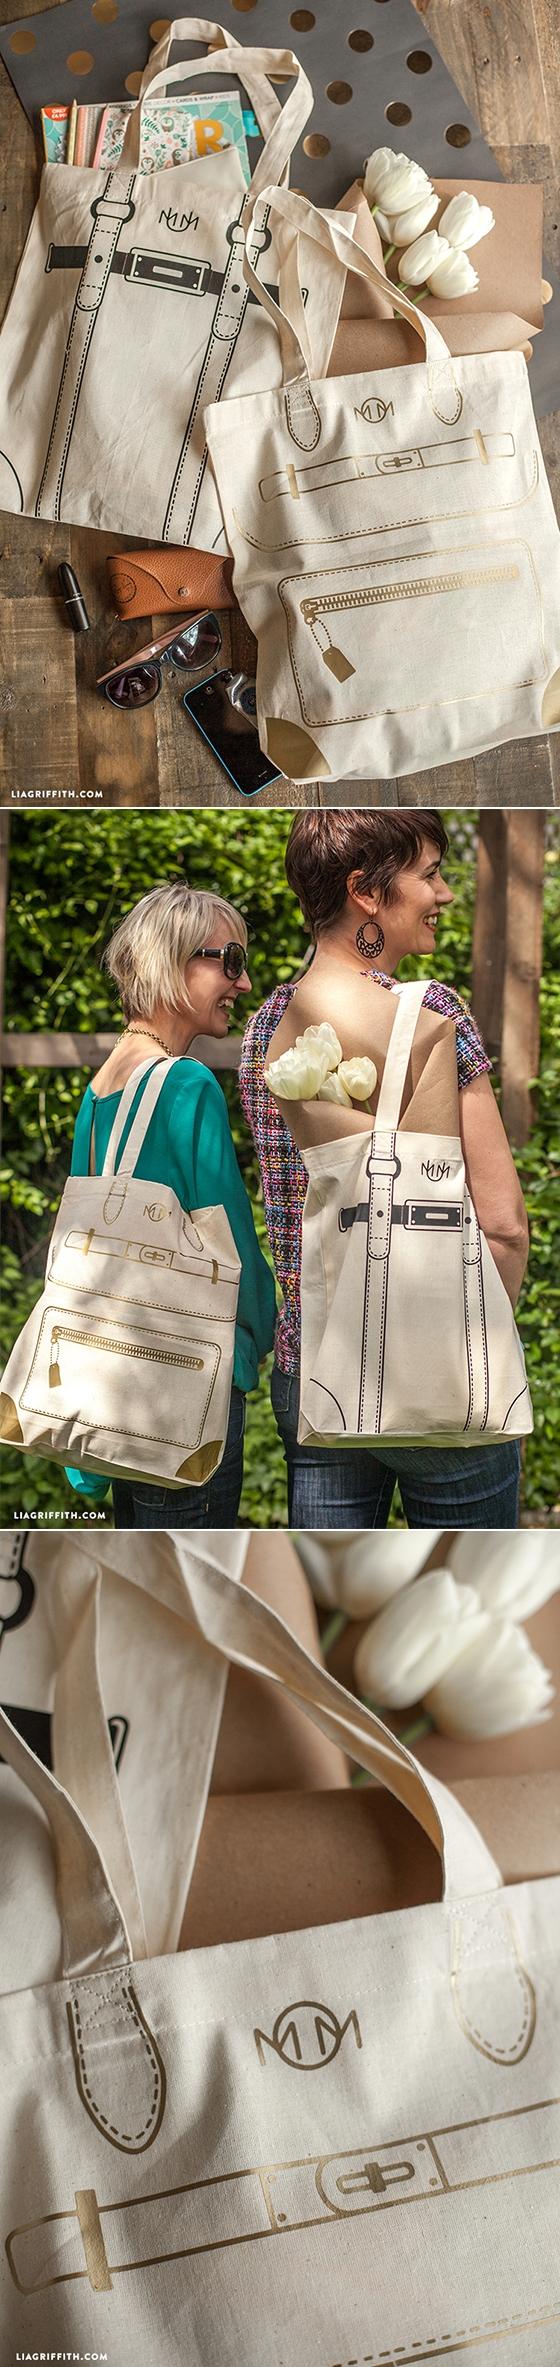 Free cut file #totebags #DIY #handbag at www.LiaGriffith.com